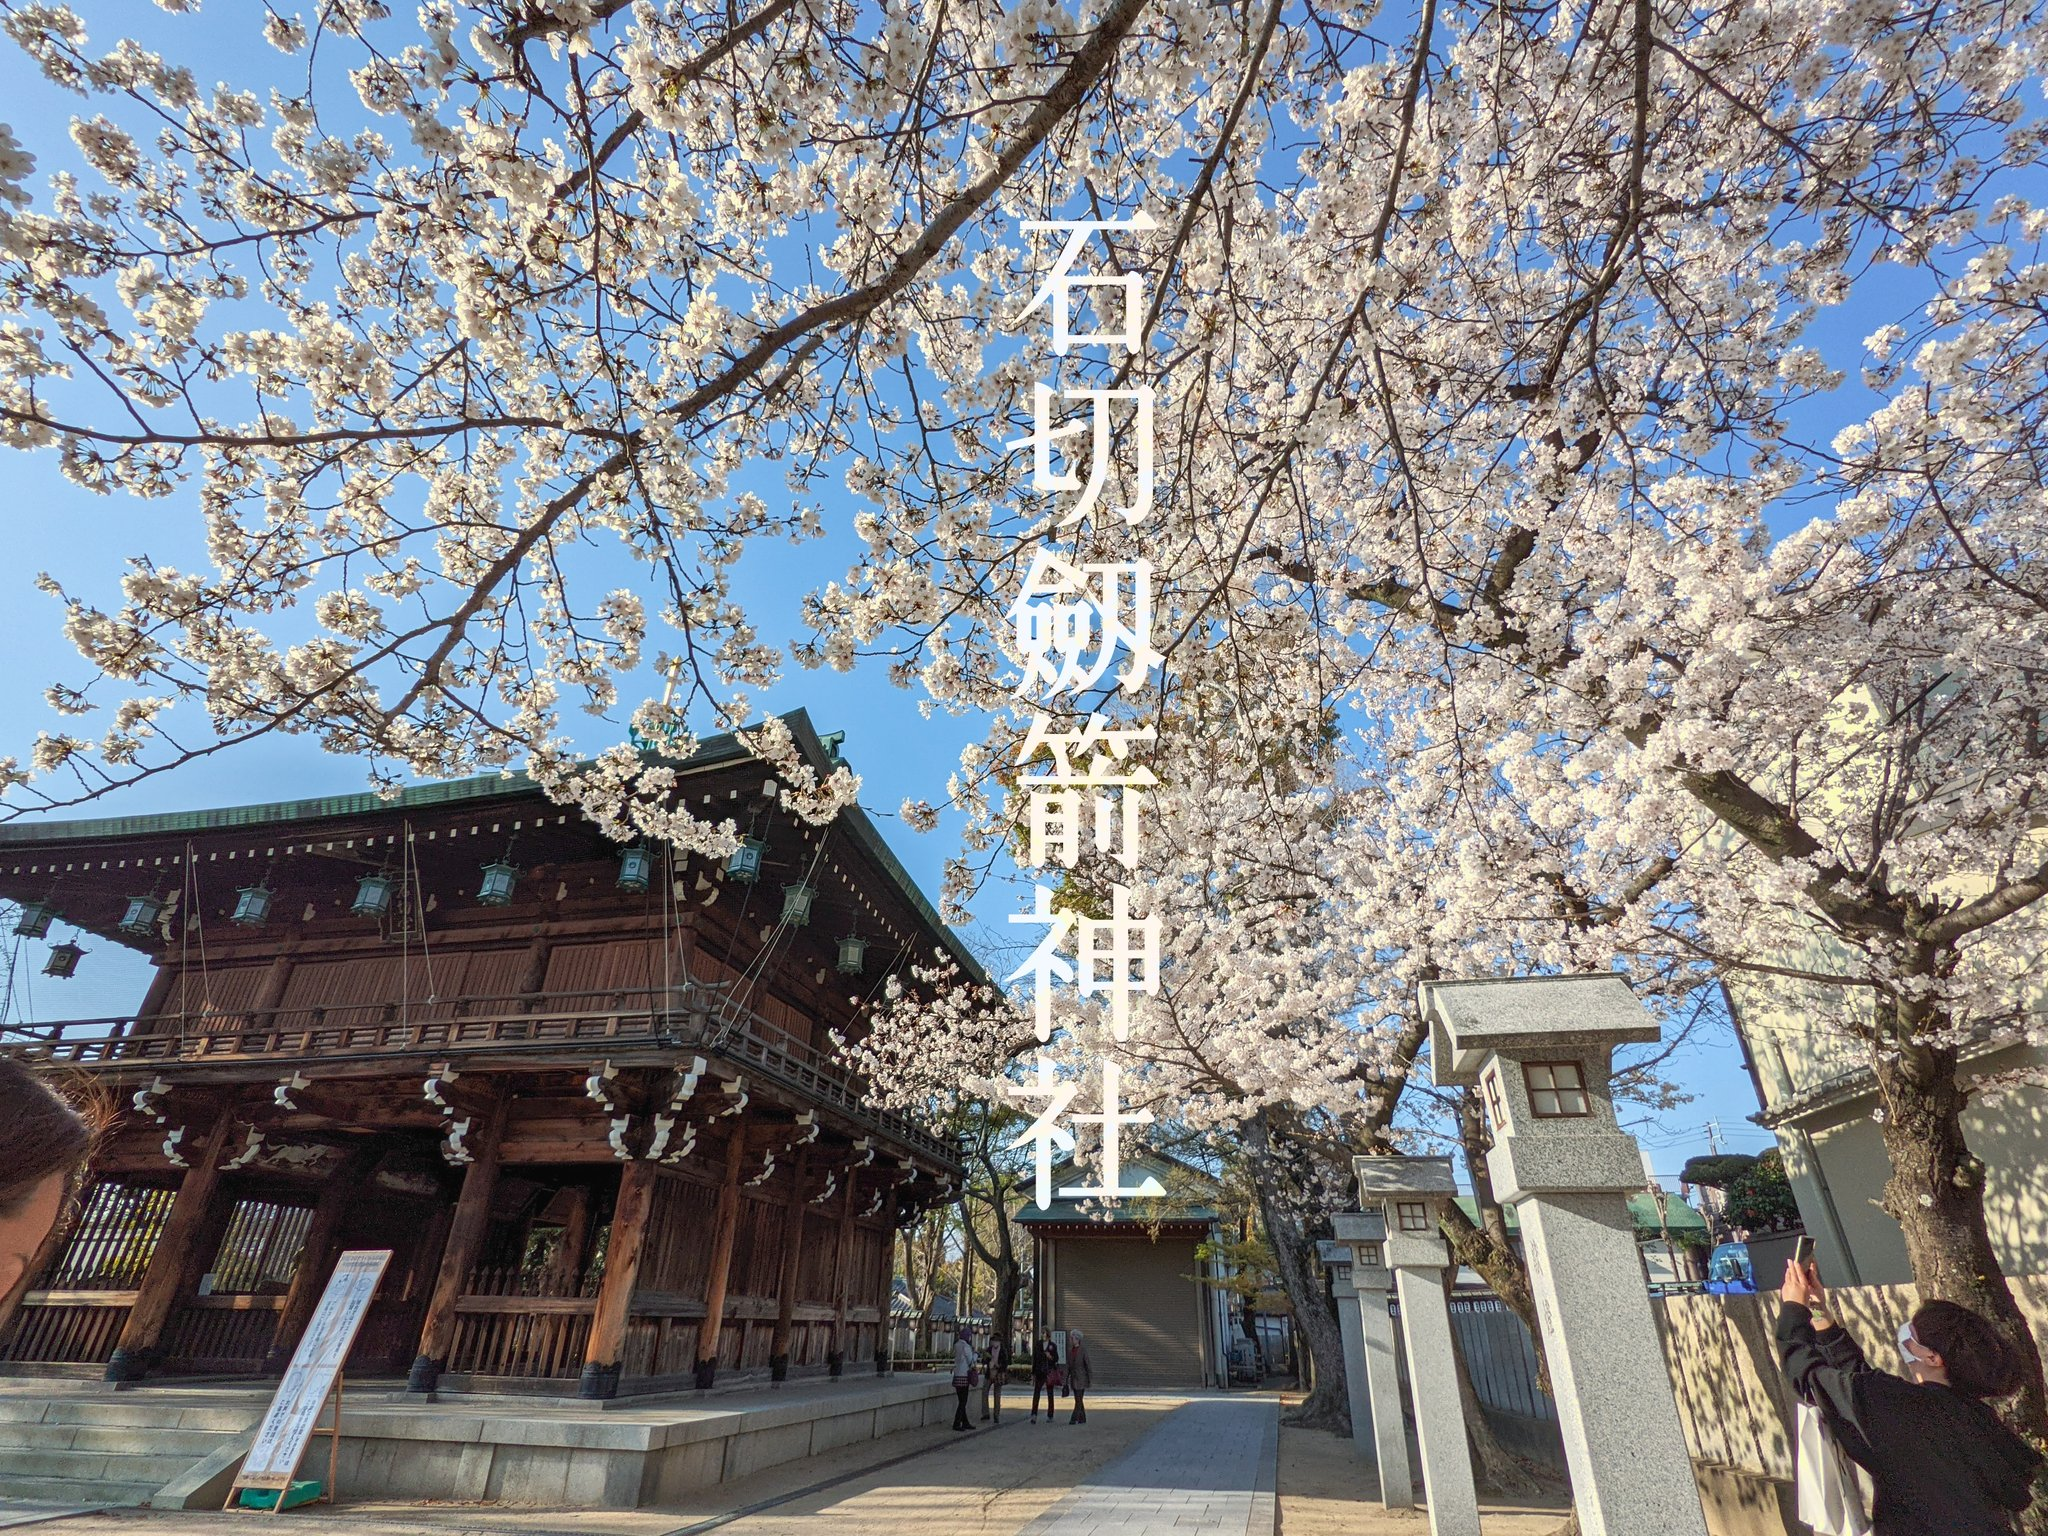 石切劔箭神社の桜(2021/03/26撮影)